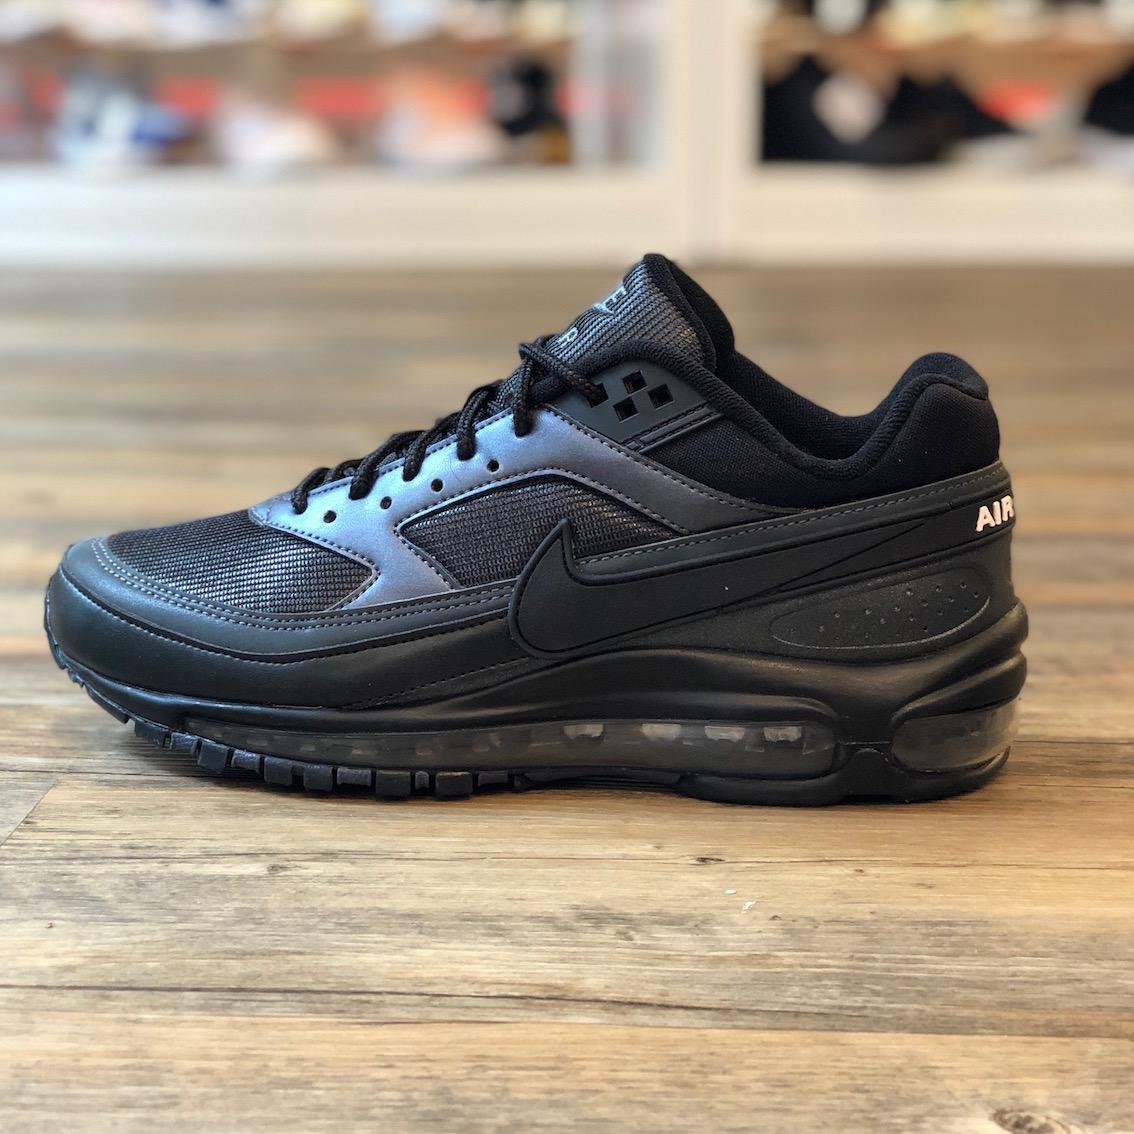 NIKE AIR MAX 97BW Gr.45 Schuhe Sneaker schwarz 270 Neu